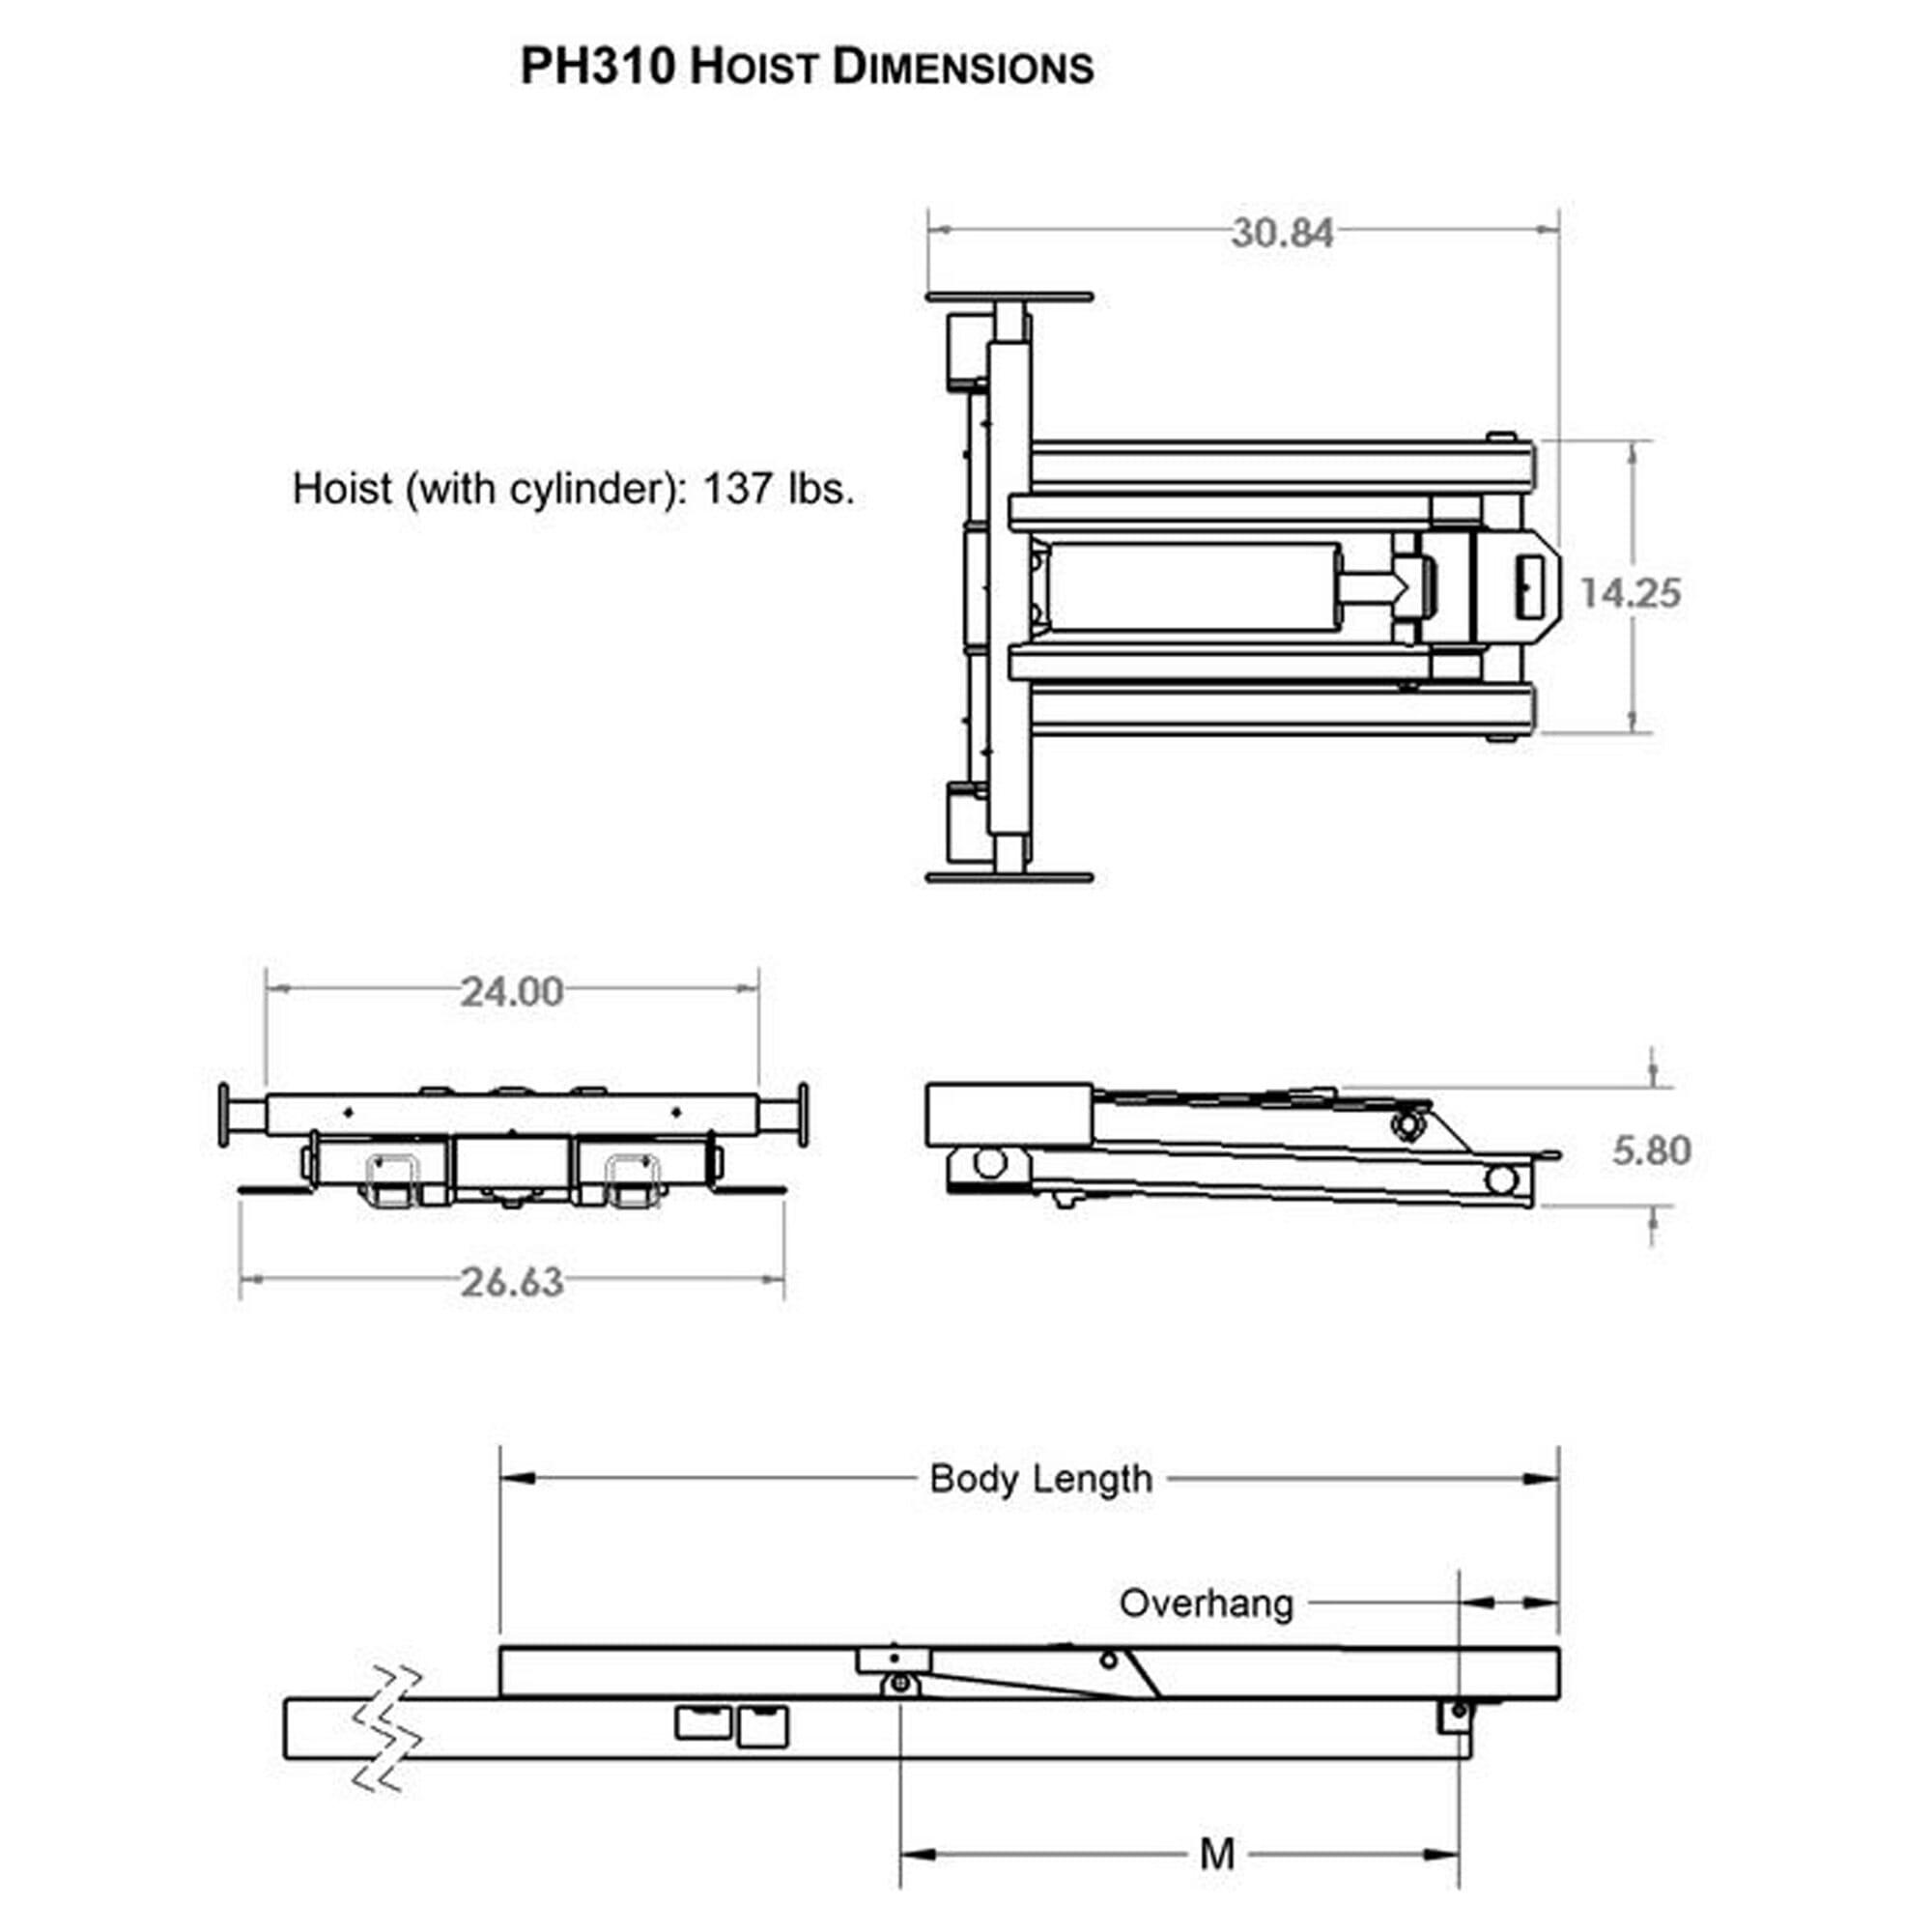 wiring diagram for a hoist diagram free printable wiring diagrams